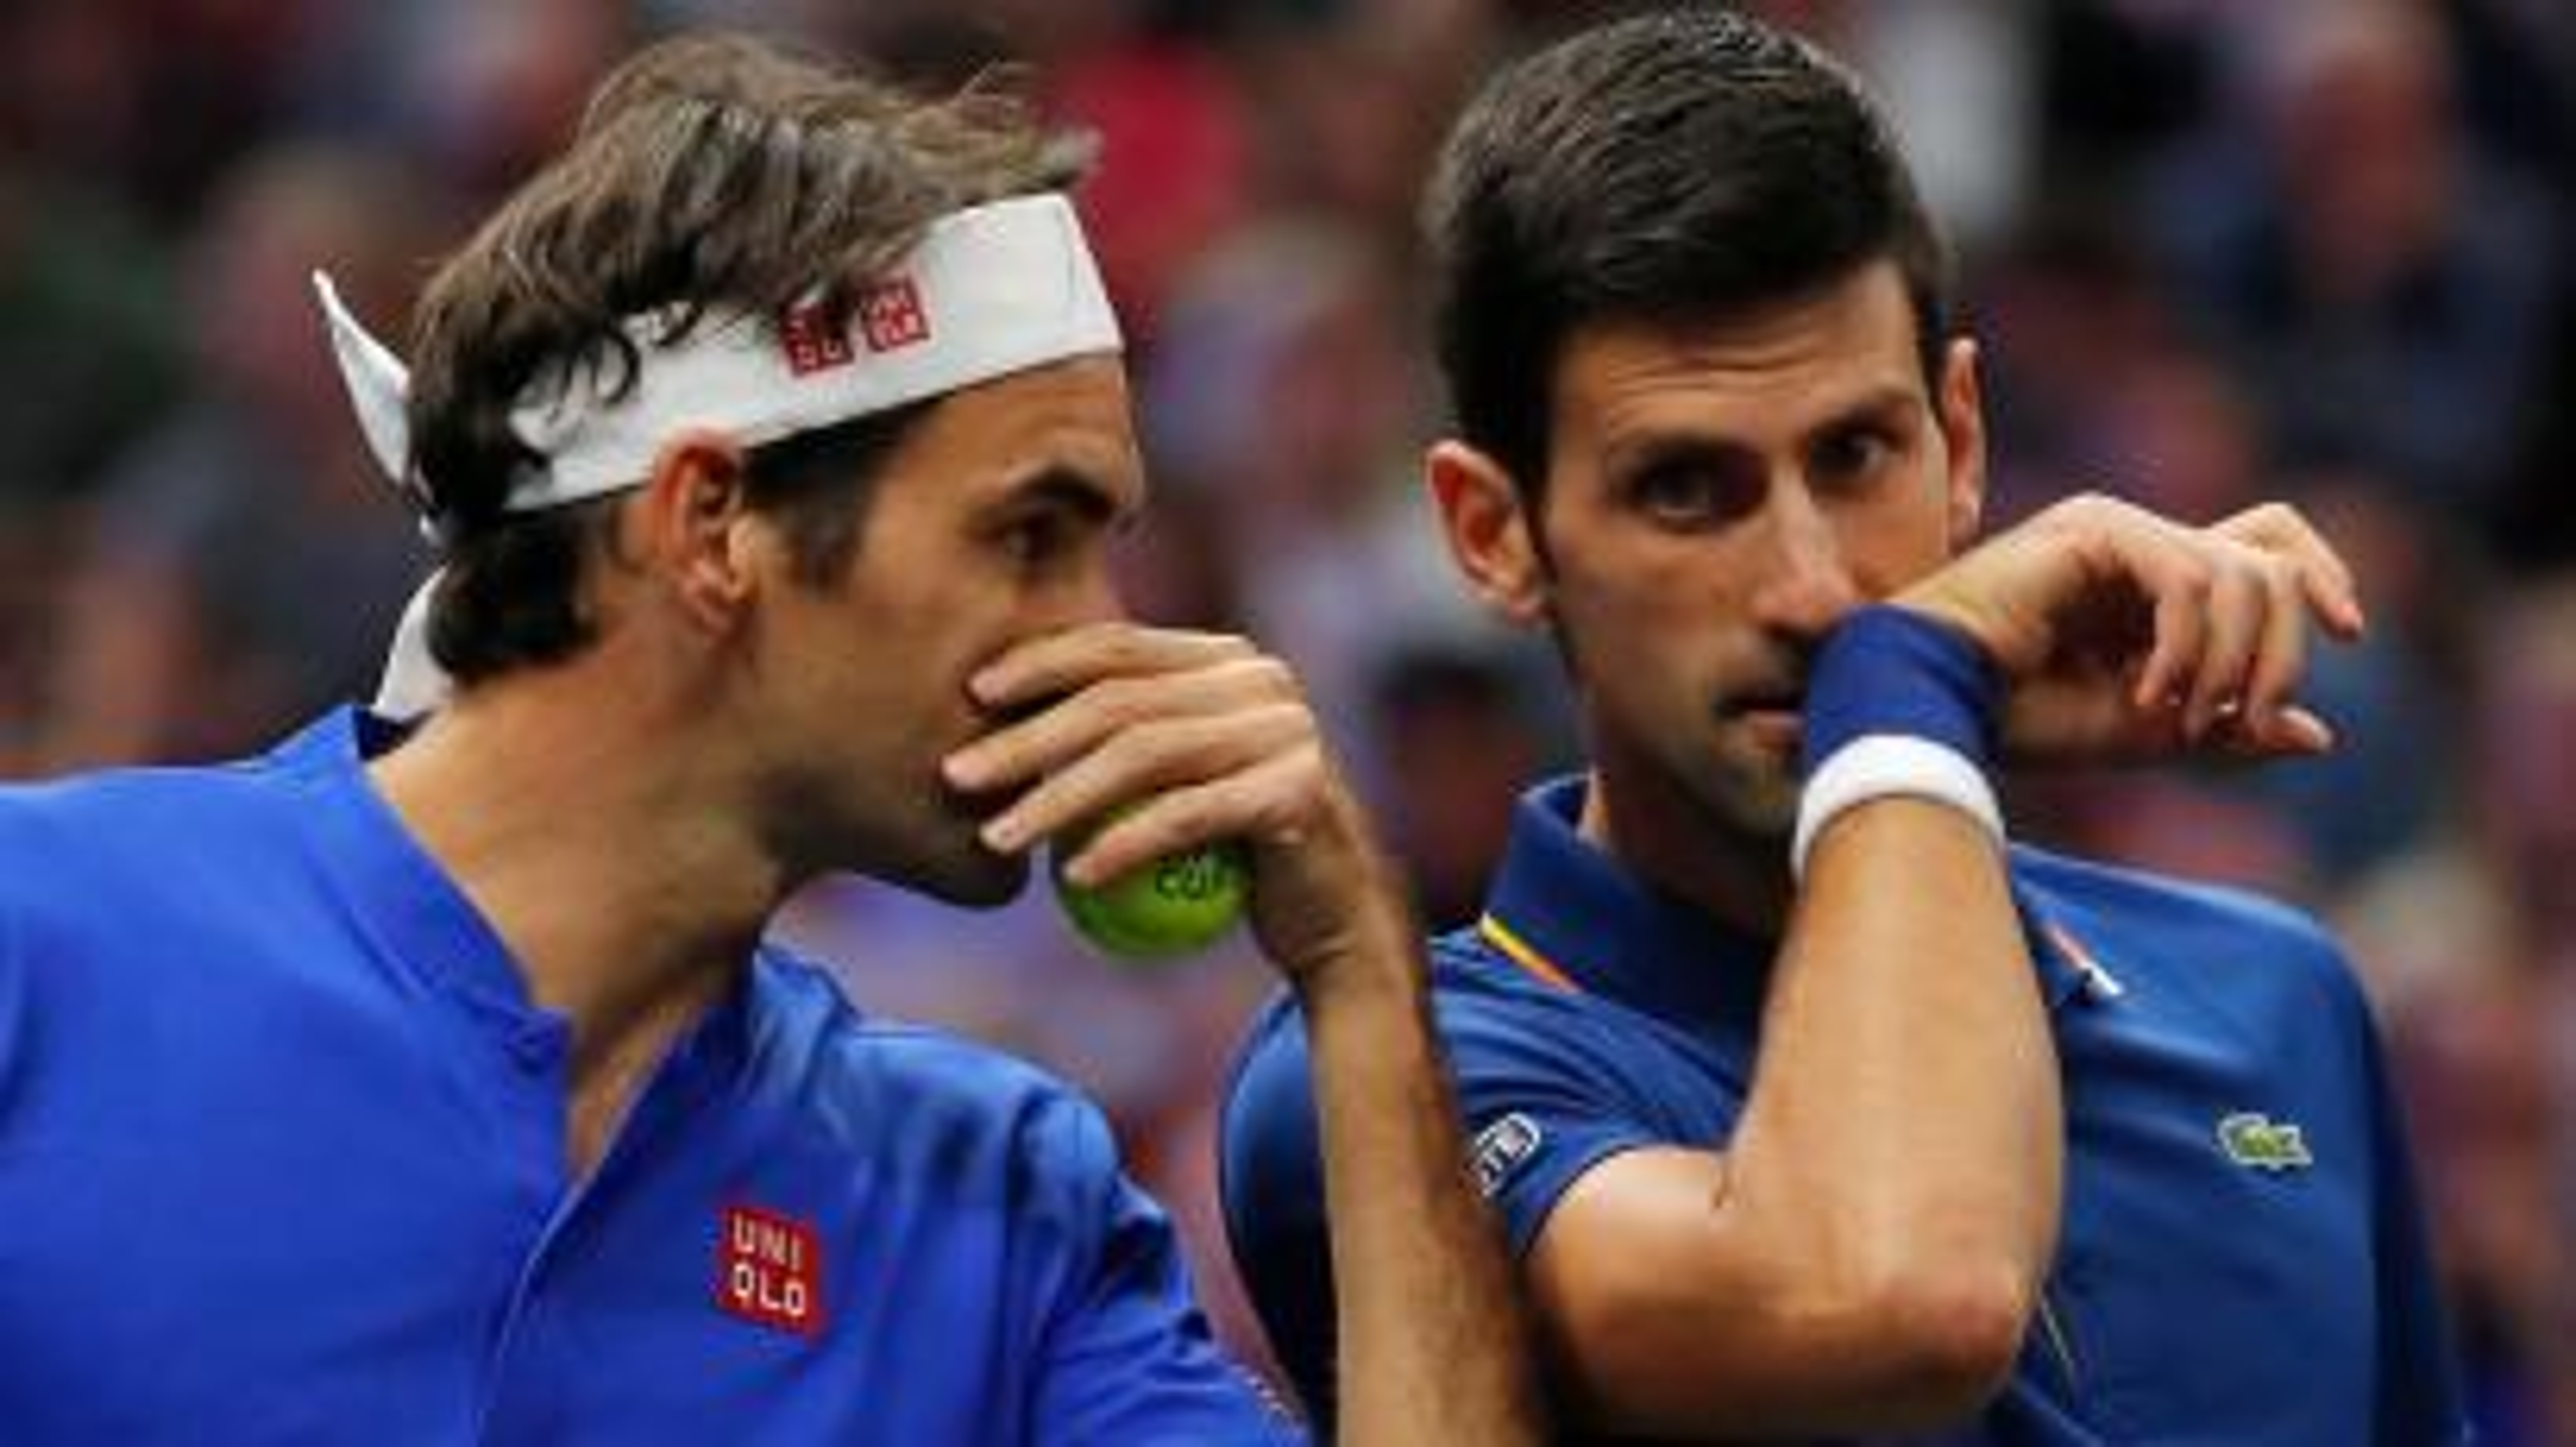 Federer and Djokovic